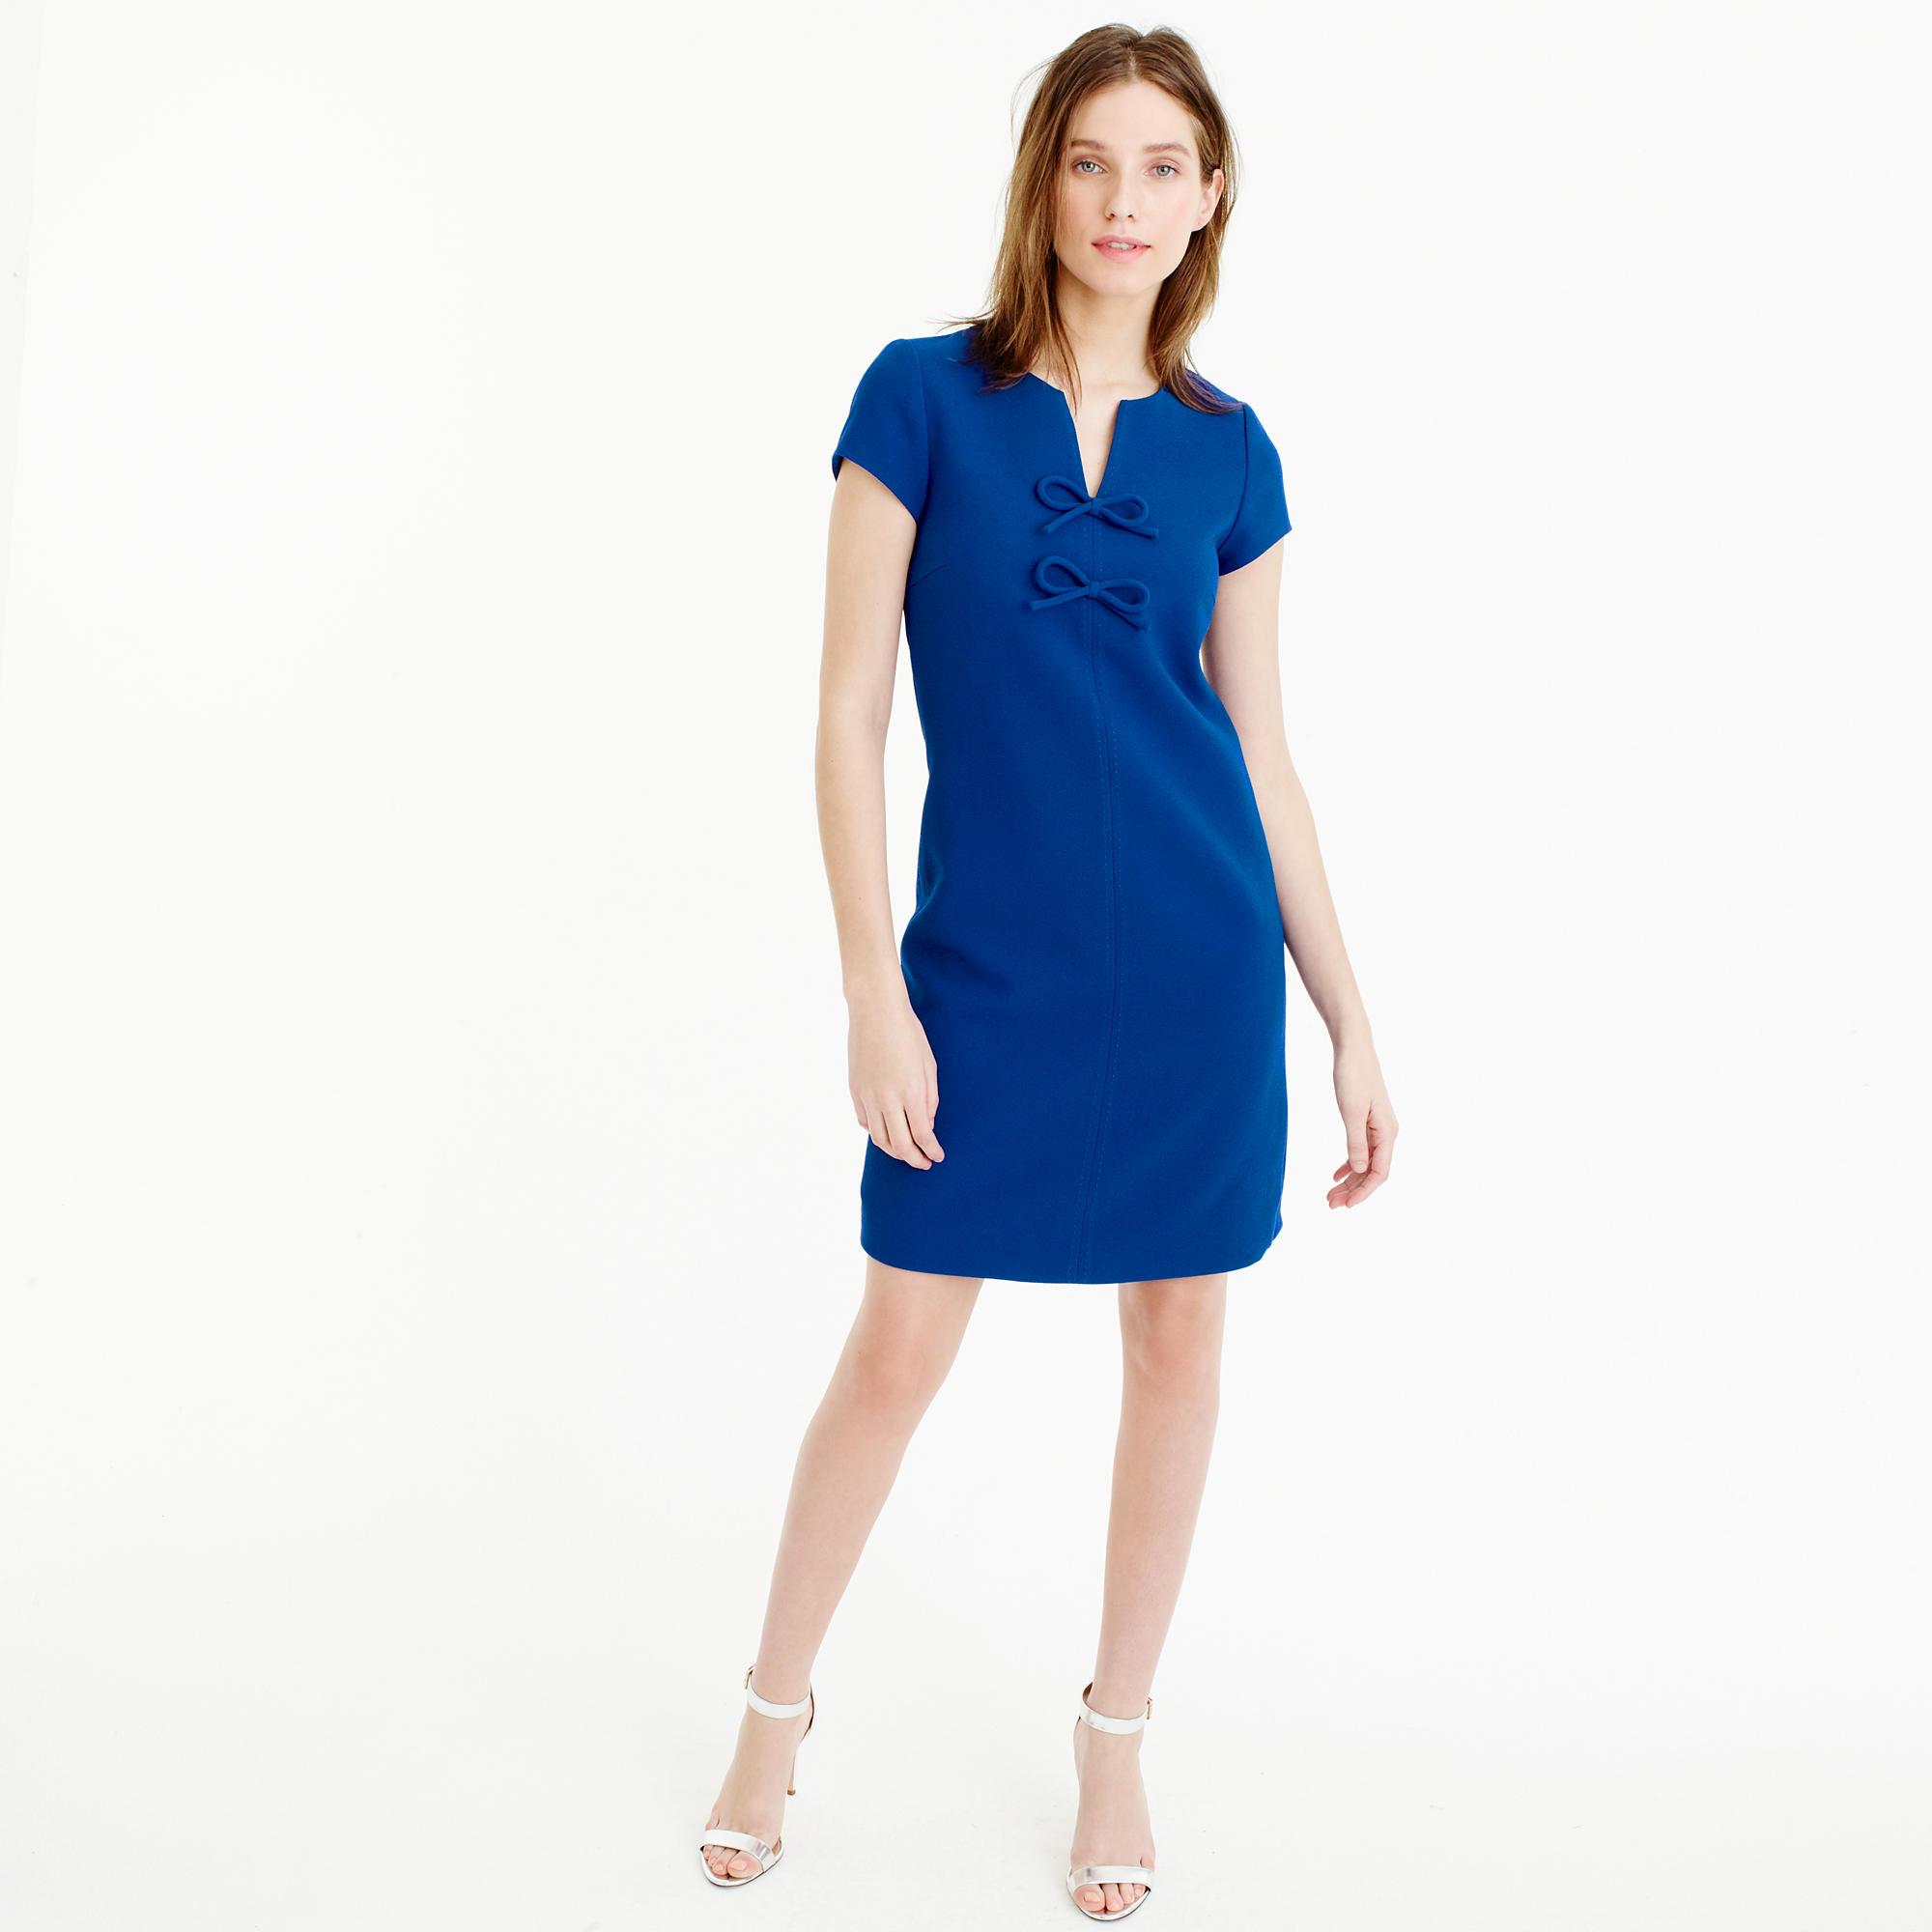 Unique Viscose Cotton Nylon This JCrew Acid Daisy Boucltweed Dress